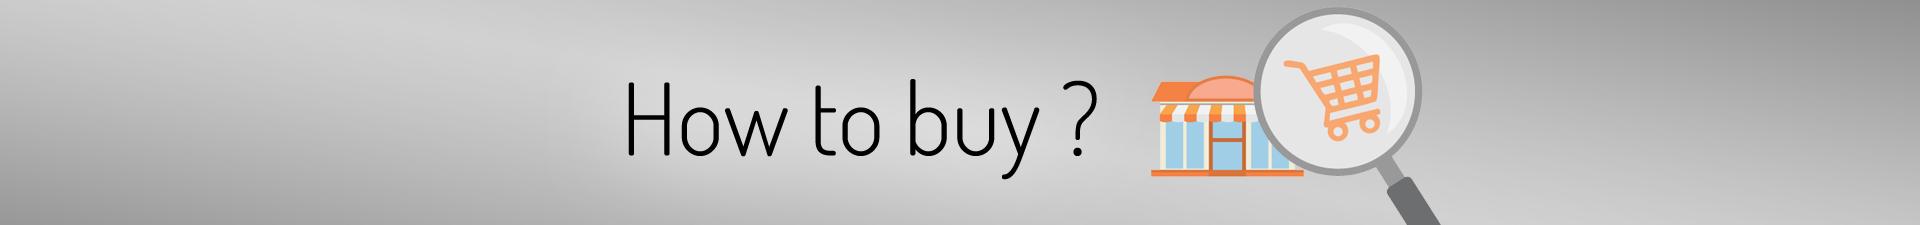 ou-acheter.png